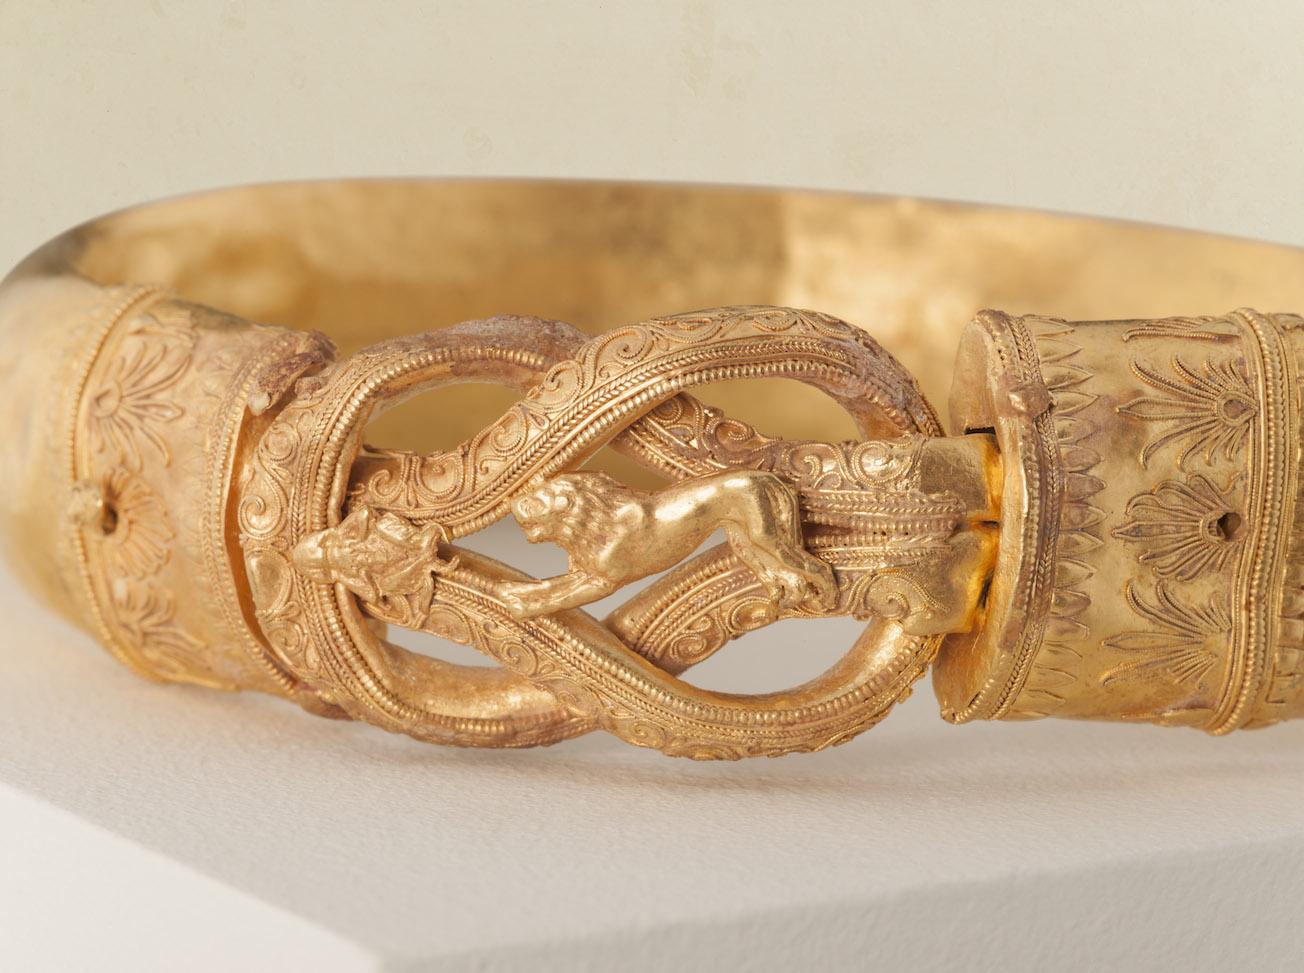 G0025-Hellenistic-Gold-Bracelet-detail-Credit-Kallos-Gallery-_-Steve-Wakeham_LOW.jpg